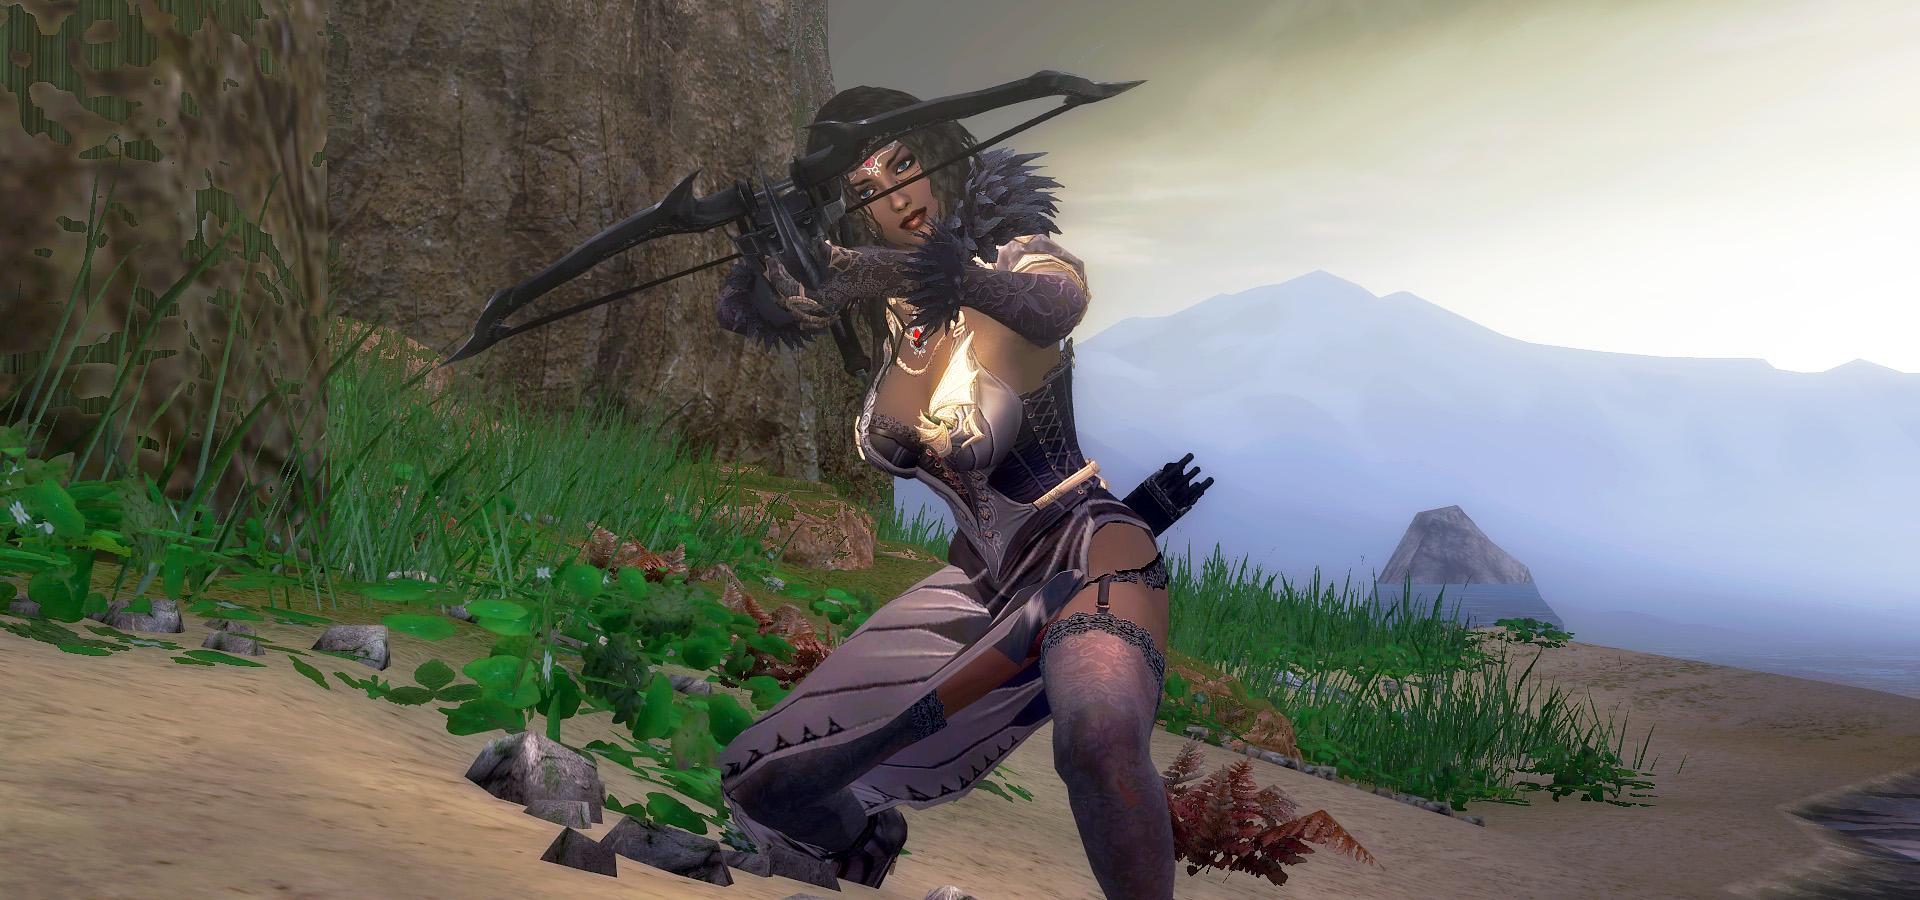 545. Найти карту сталгрима.jpg - Elder Scrolls 5: Skyrim, the CBBE, Сборка-21